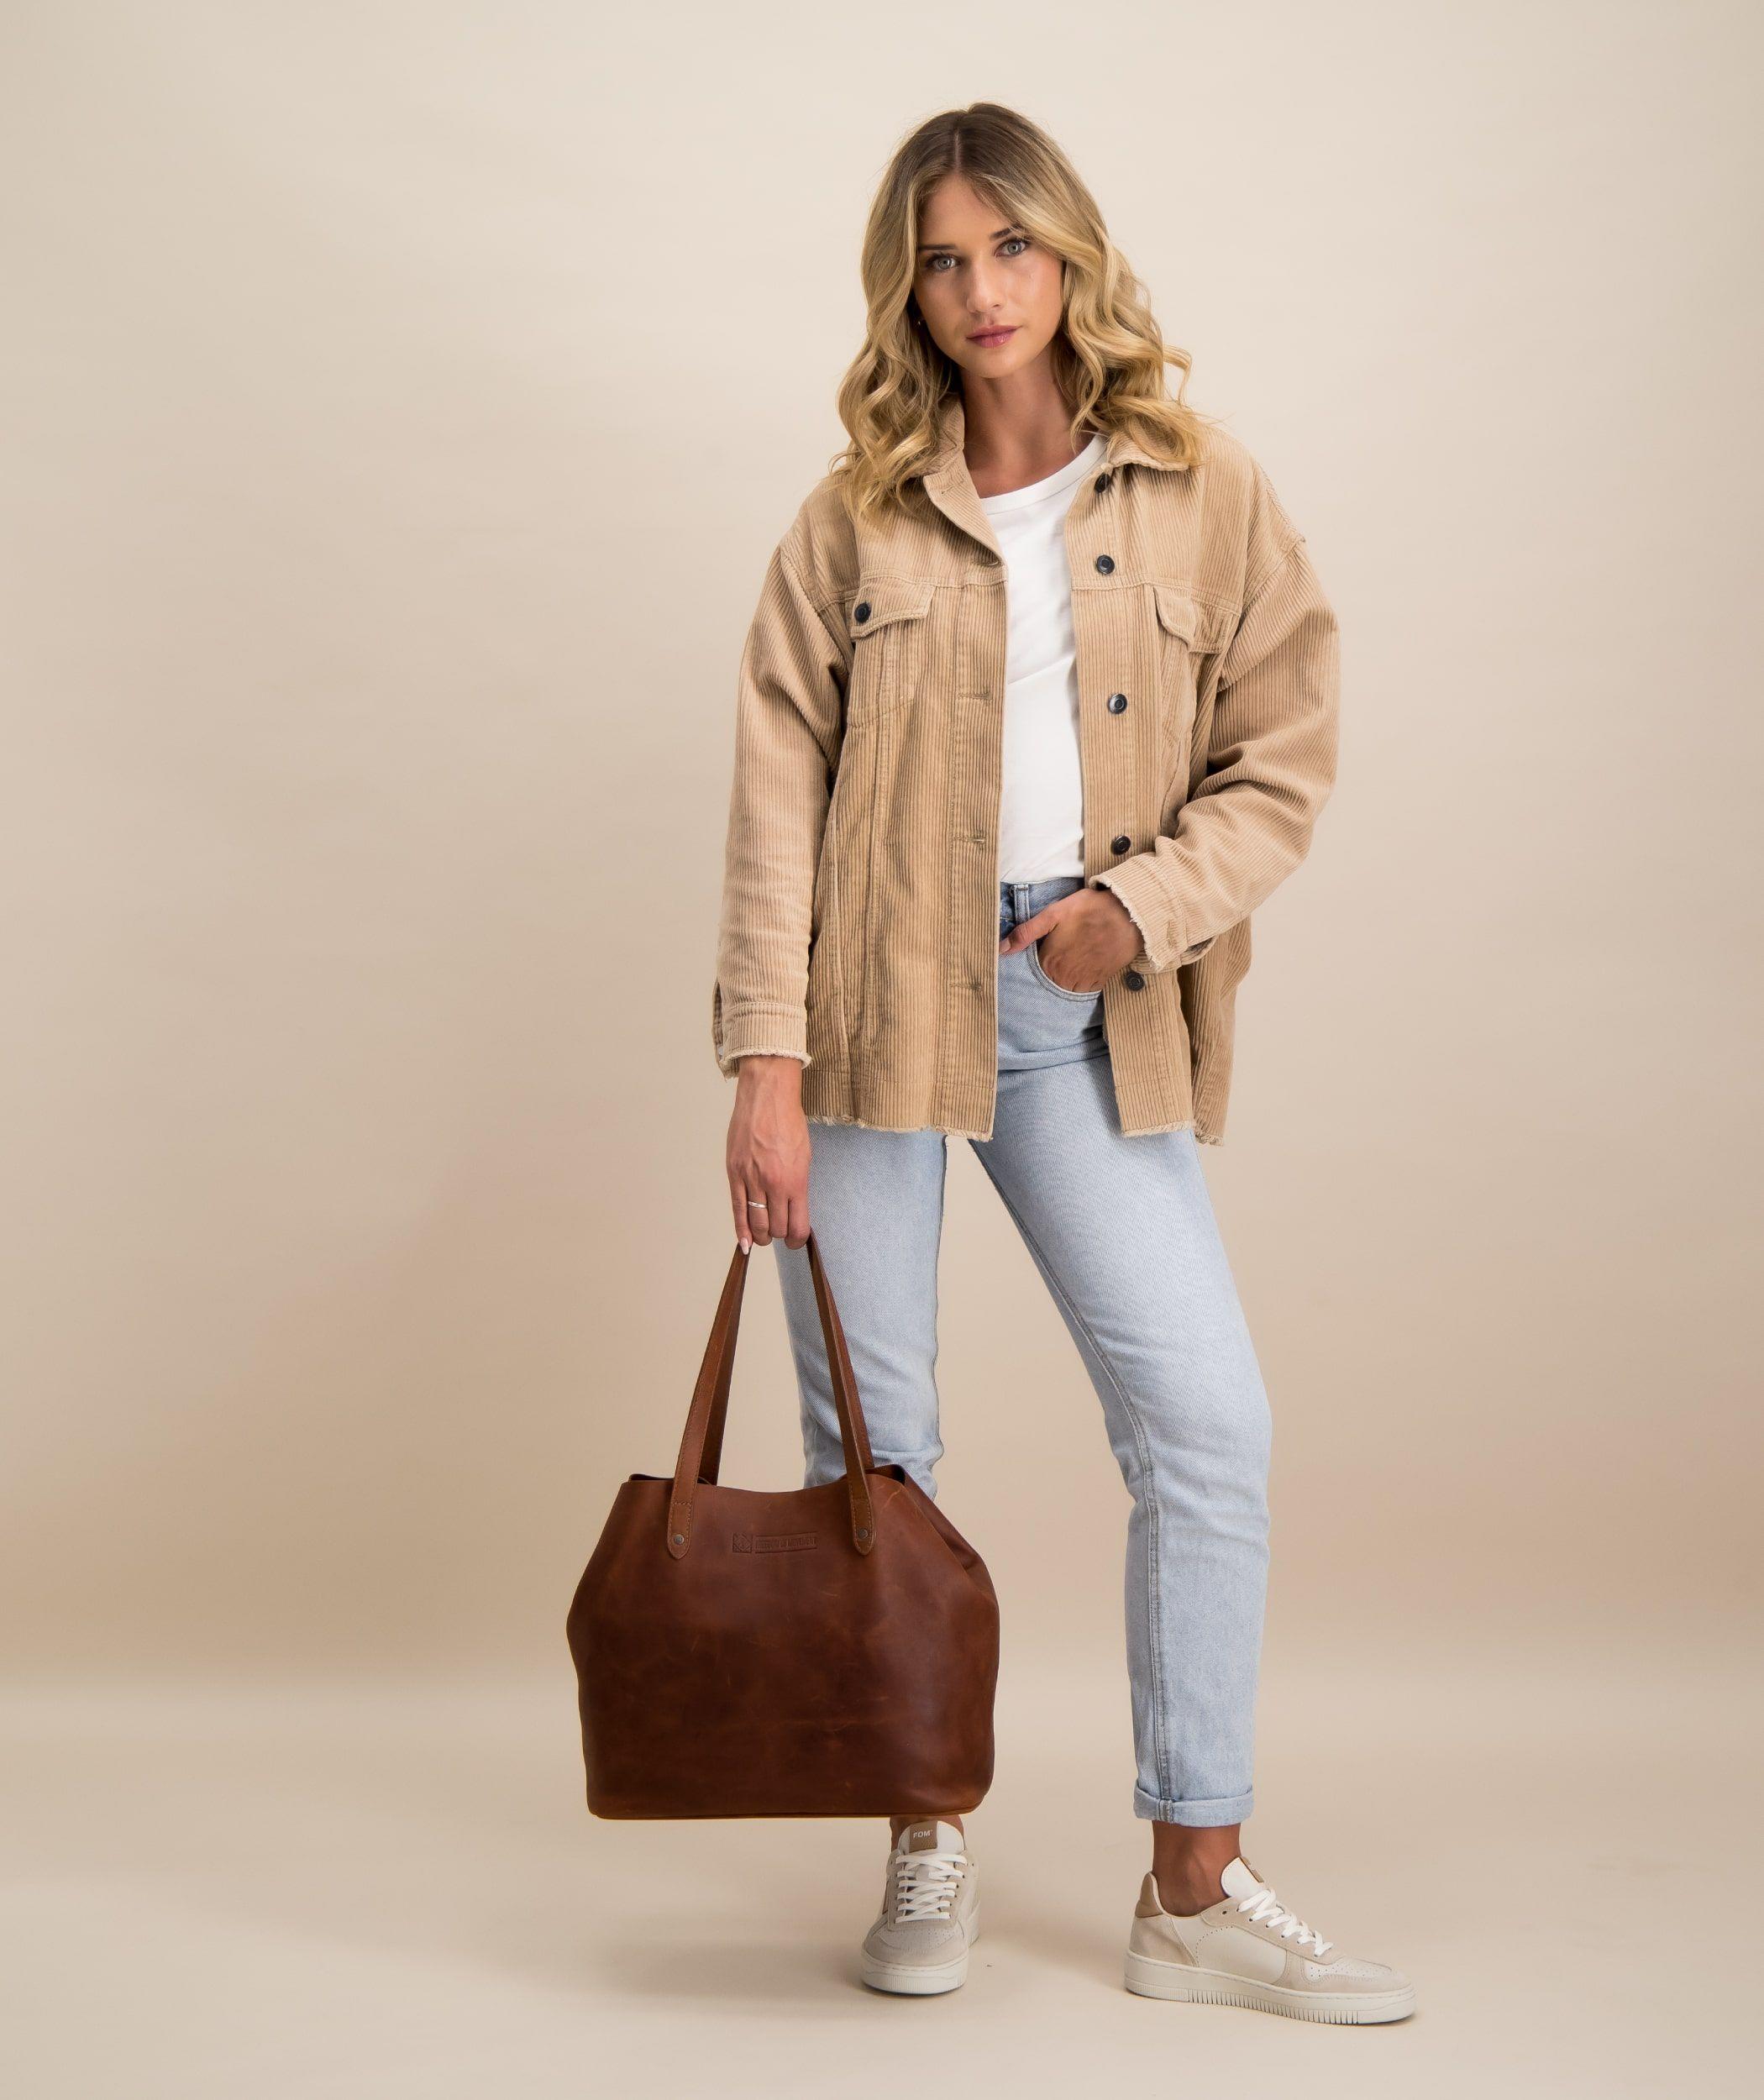 Model with handbag